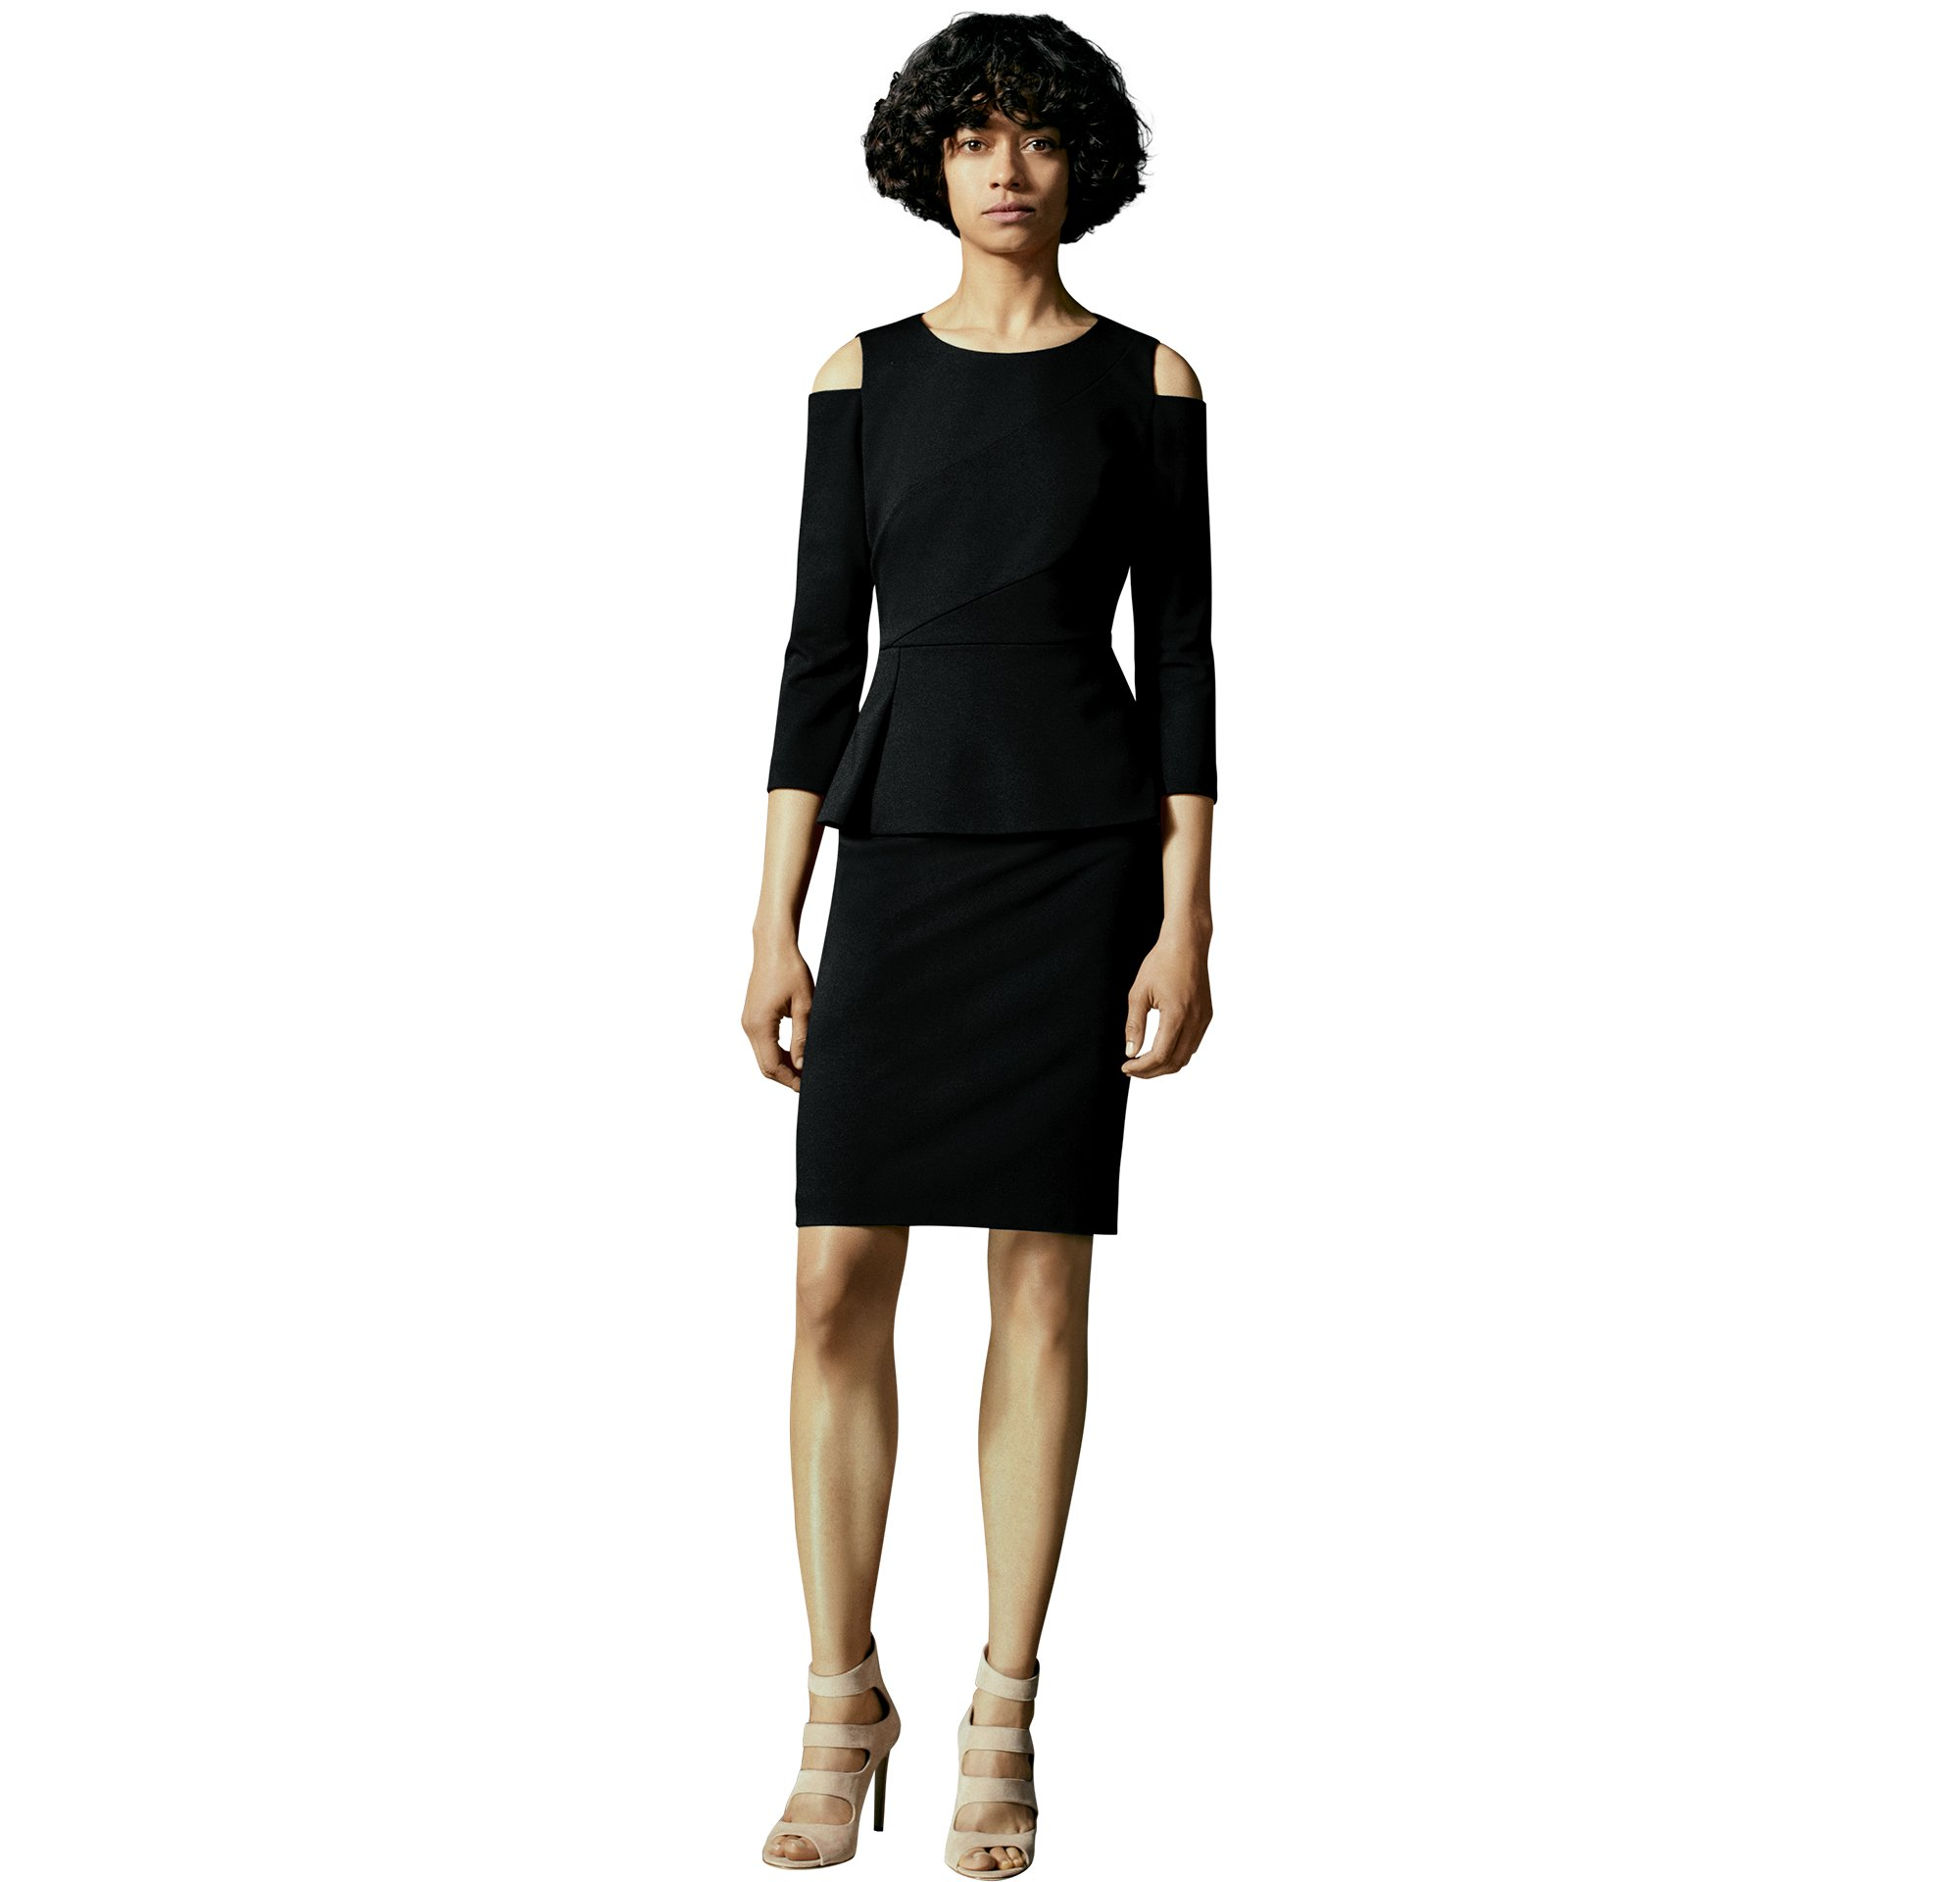 Dress by HUGO